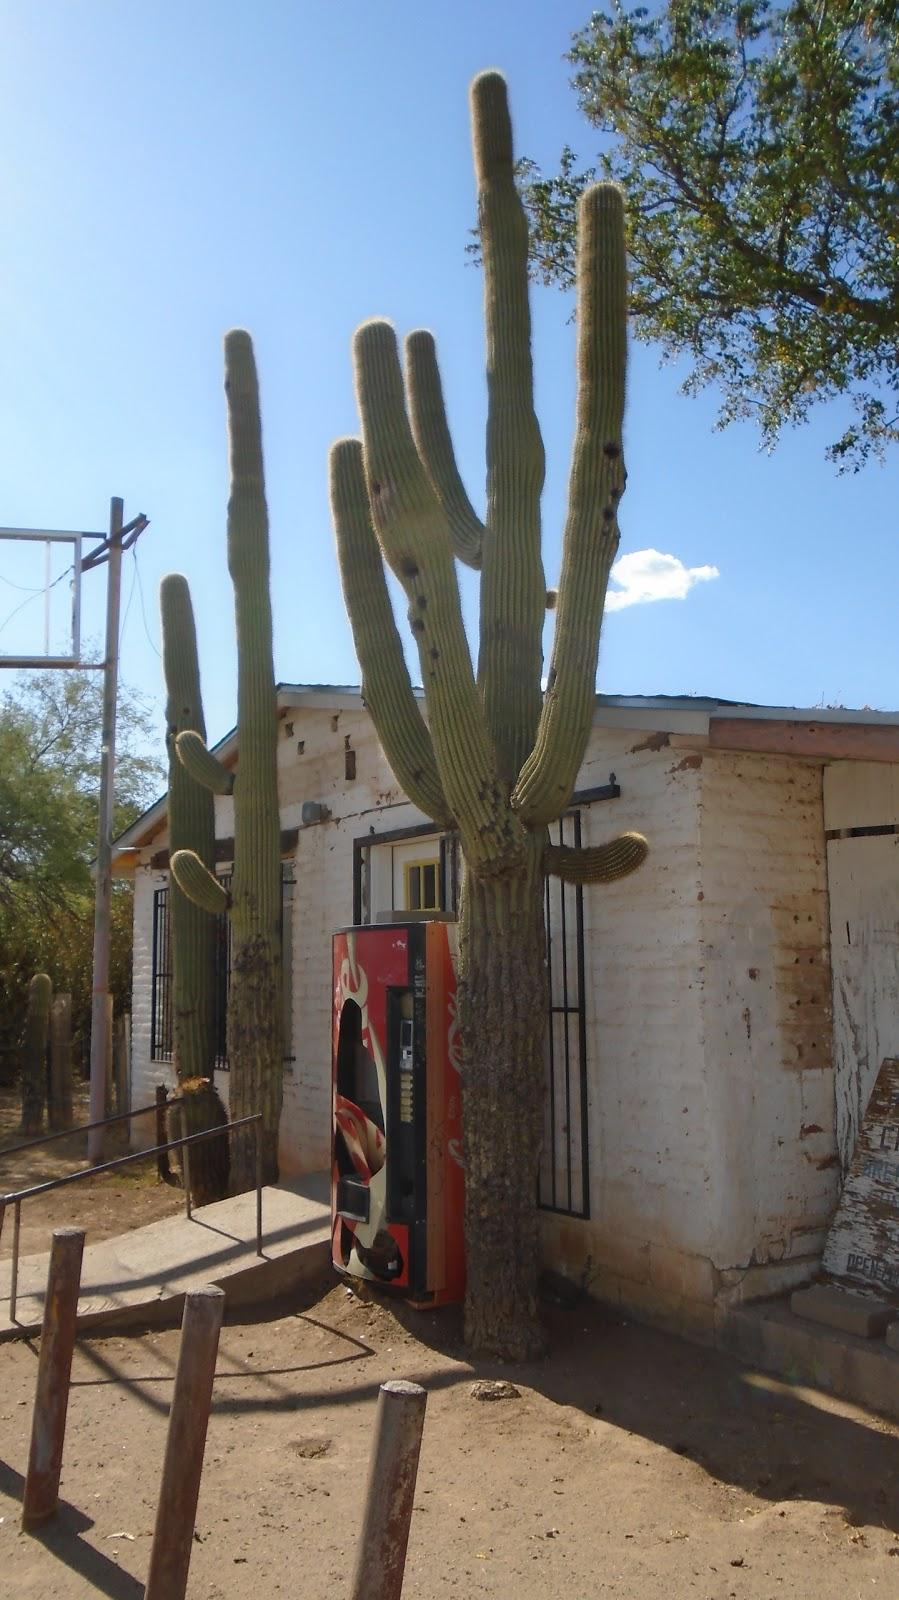 The Papago Café - cafe    Photo 7 of 7   Address: Sells, AZ 85634, USA   Phone: (520) 383-3510